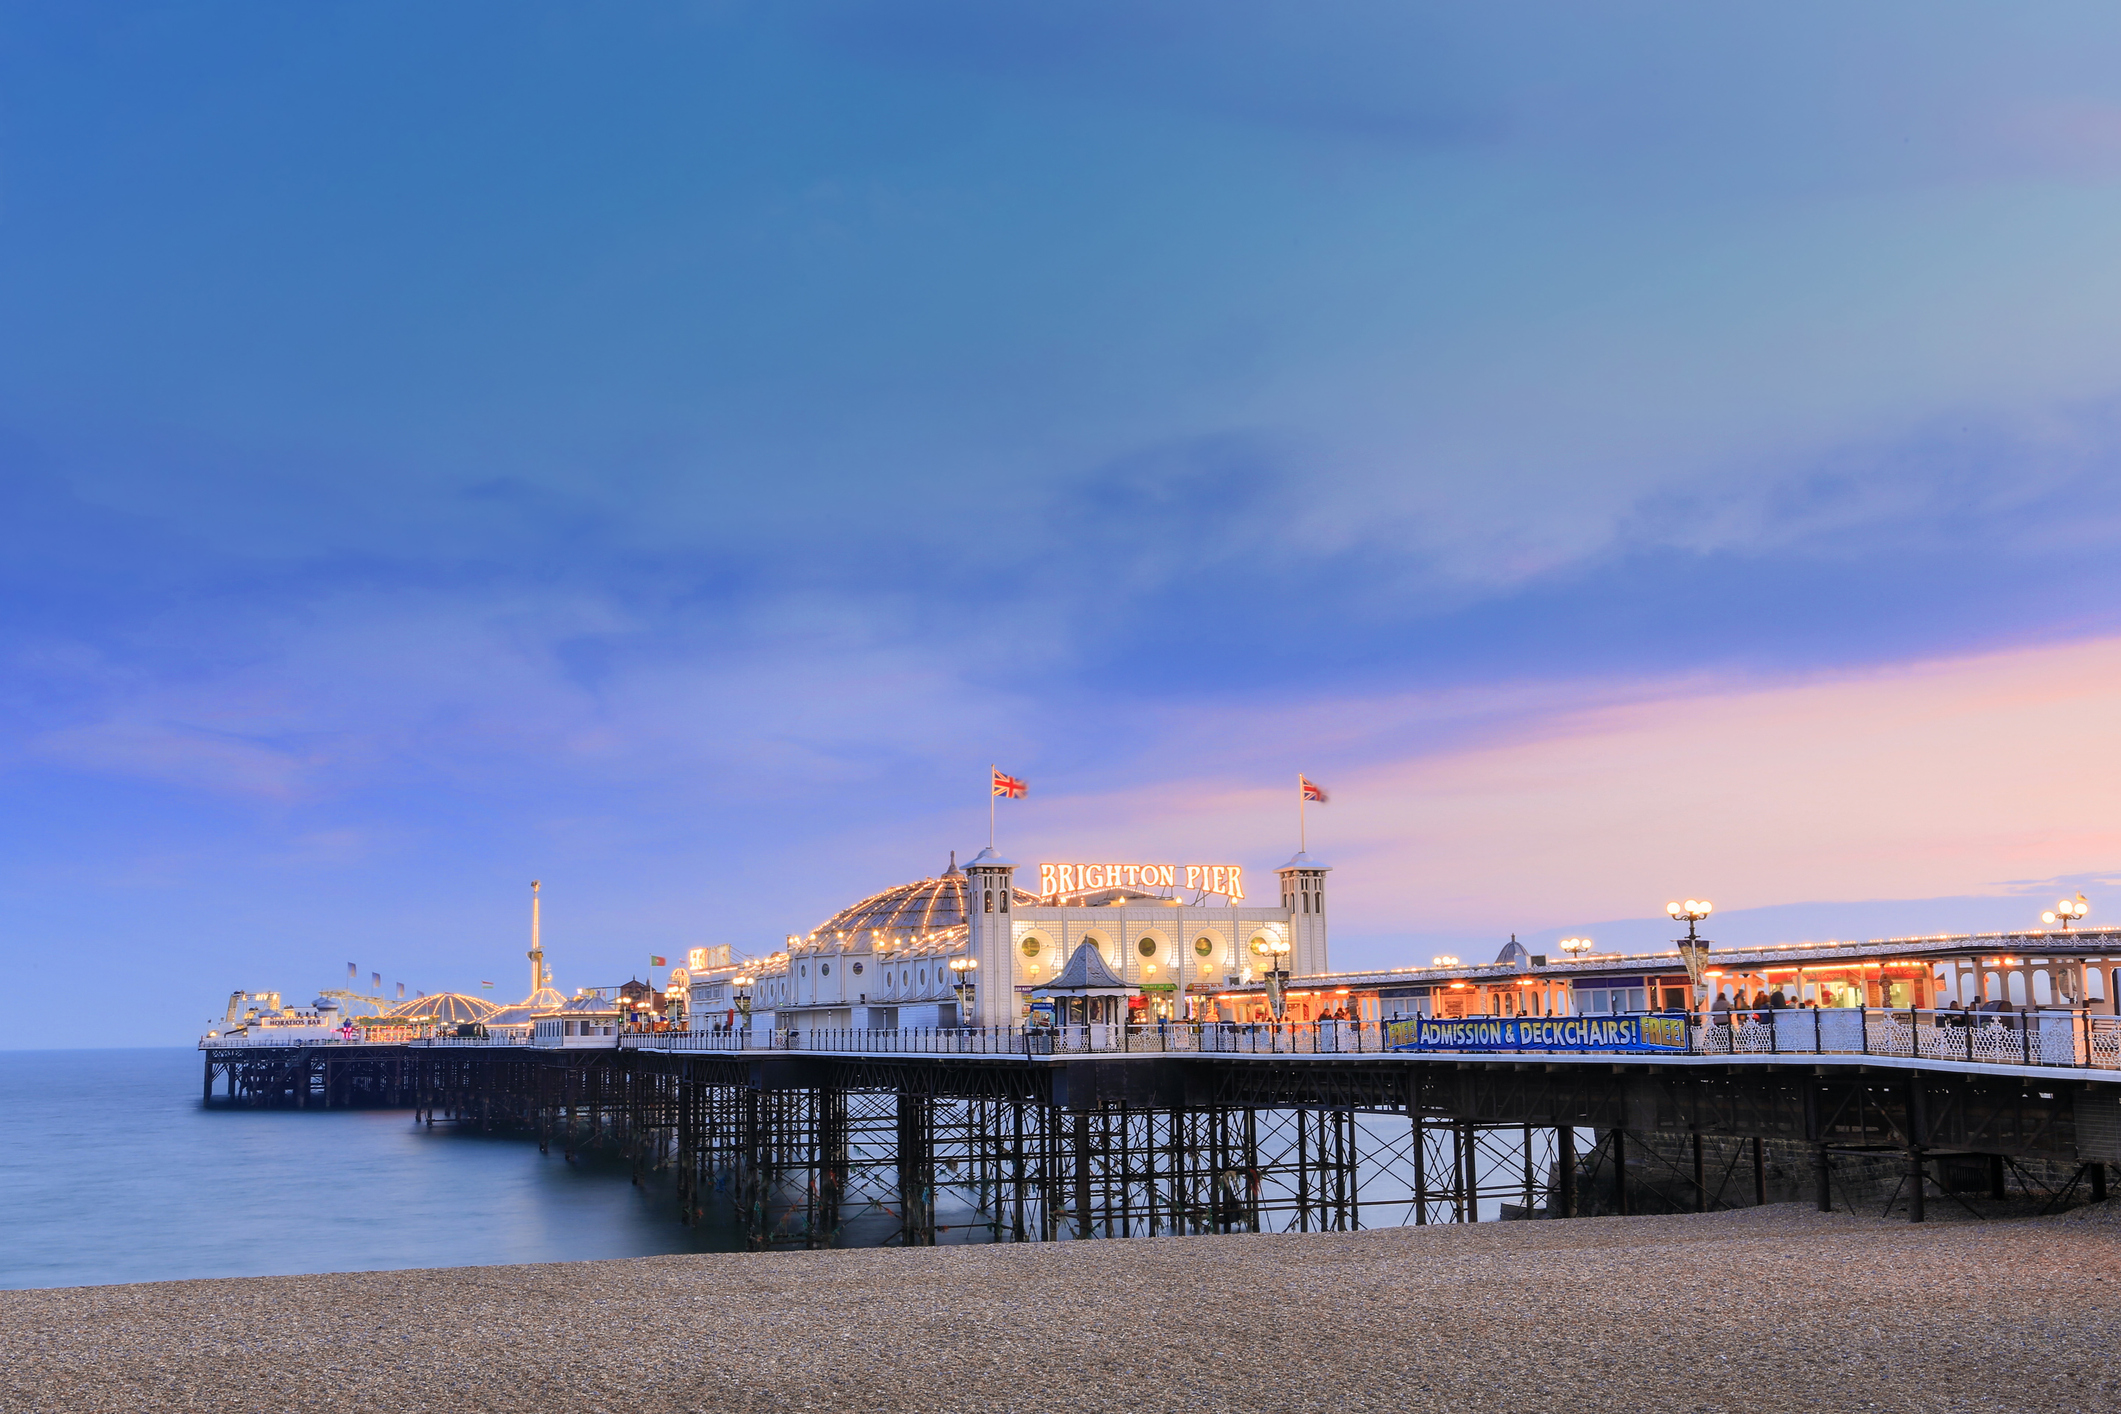 Brighton pier (Getty images)